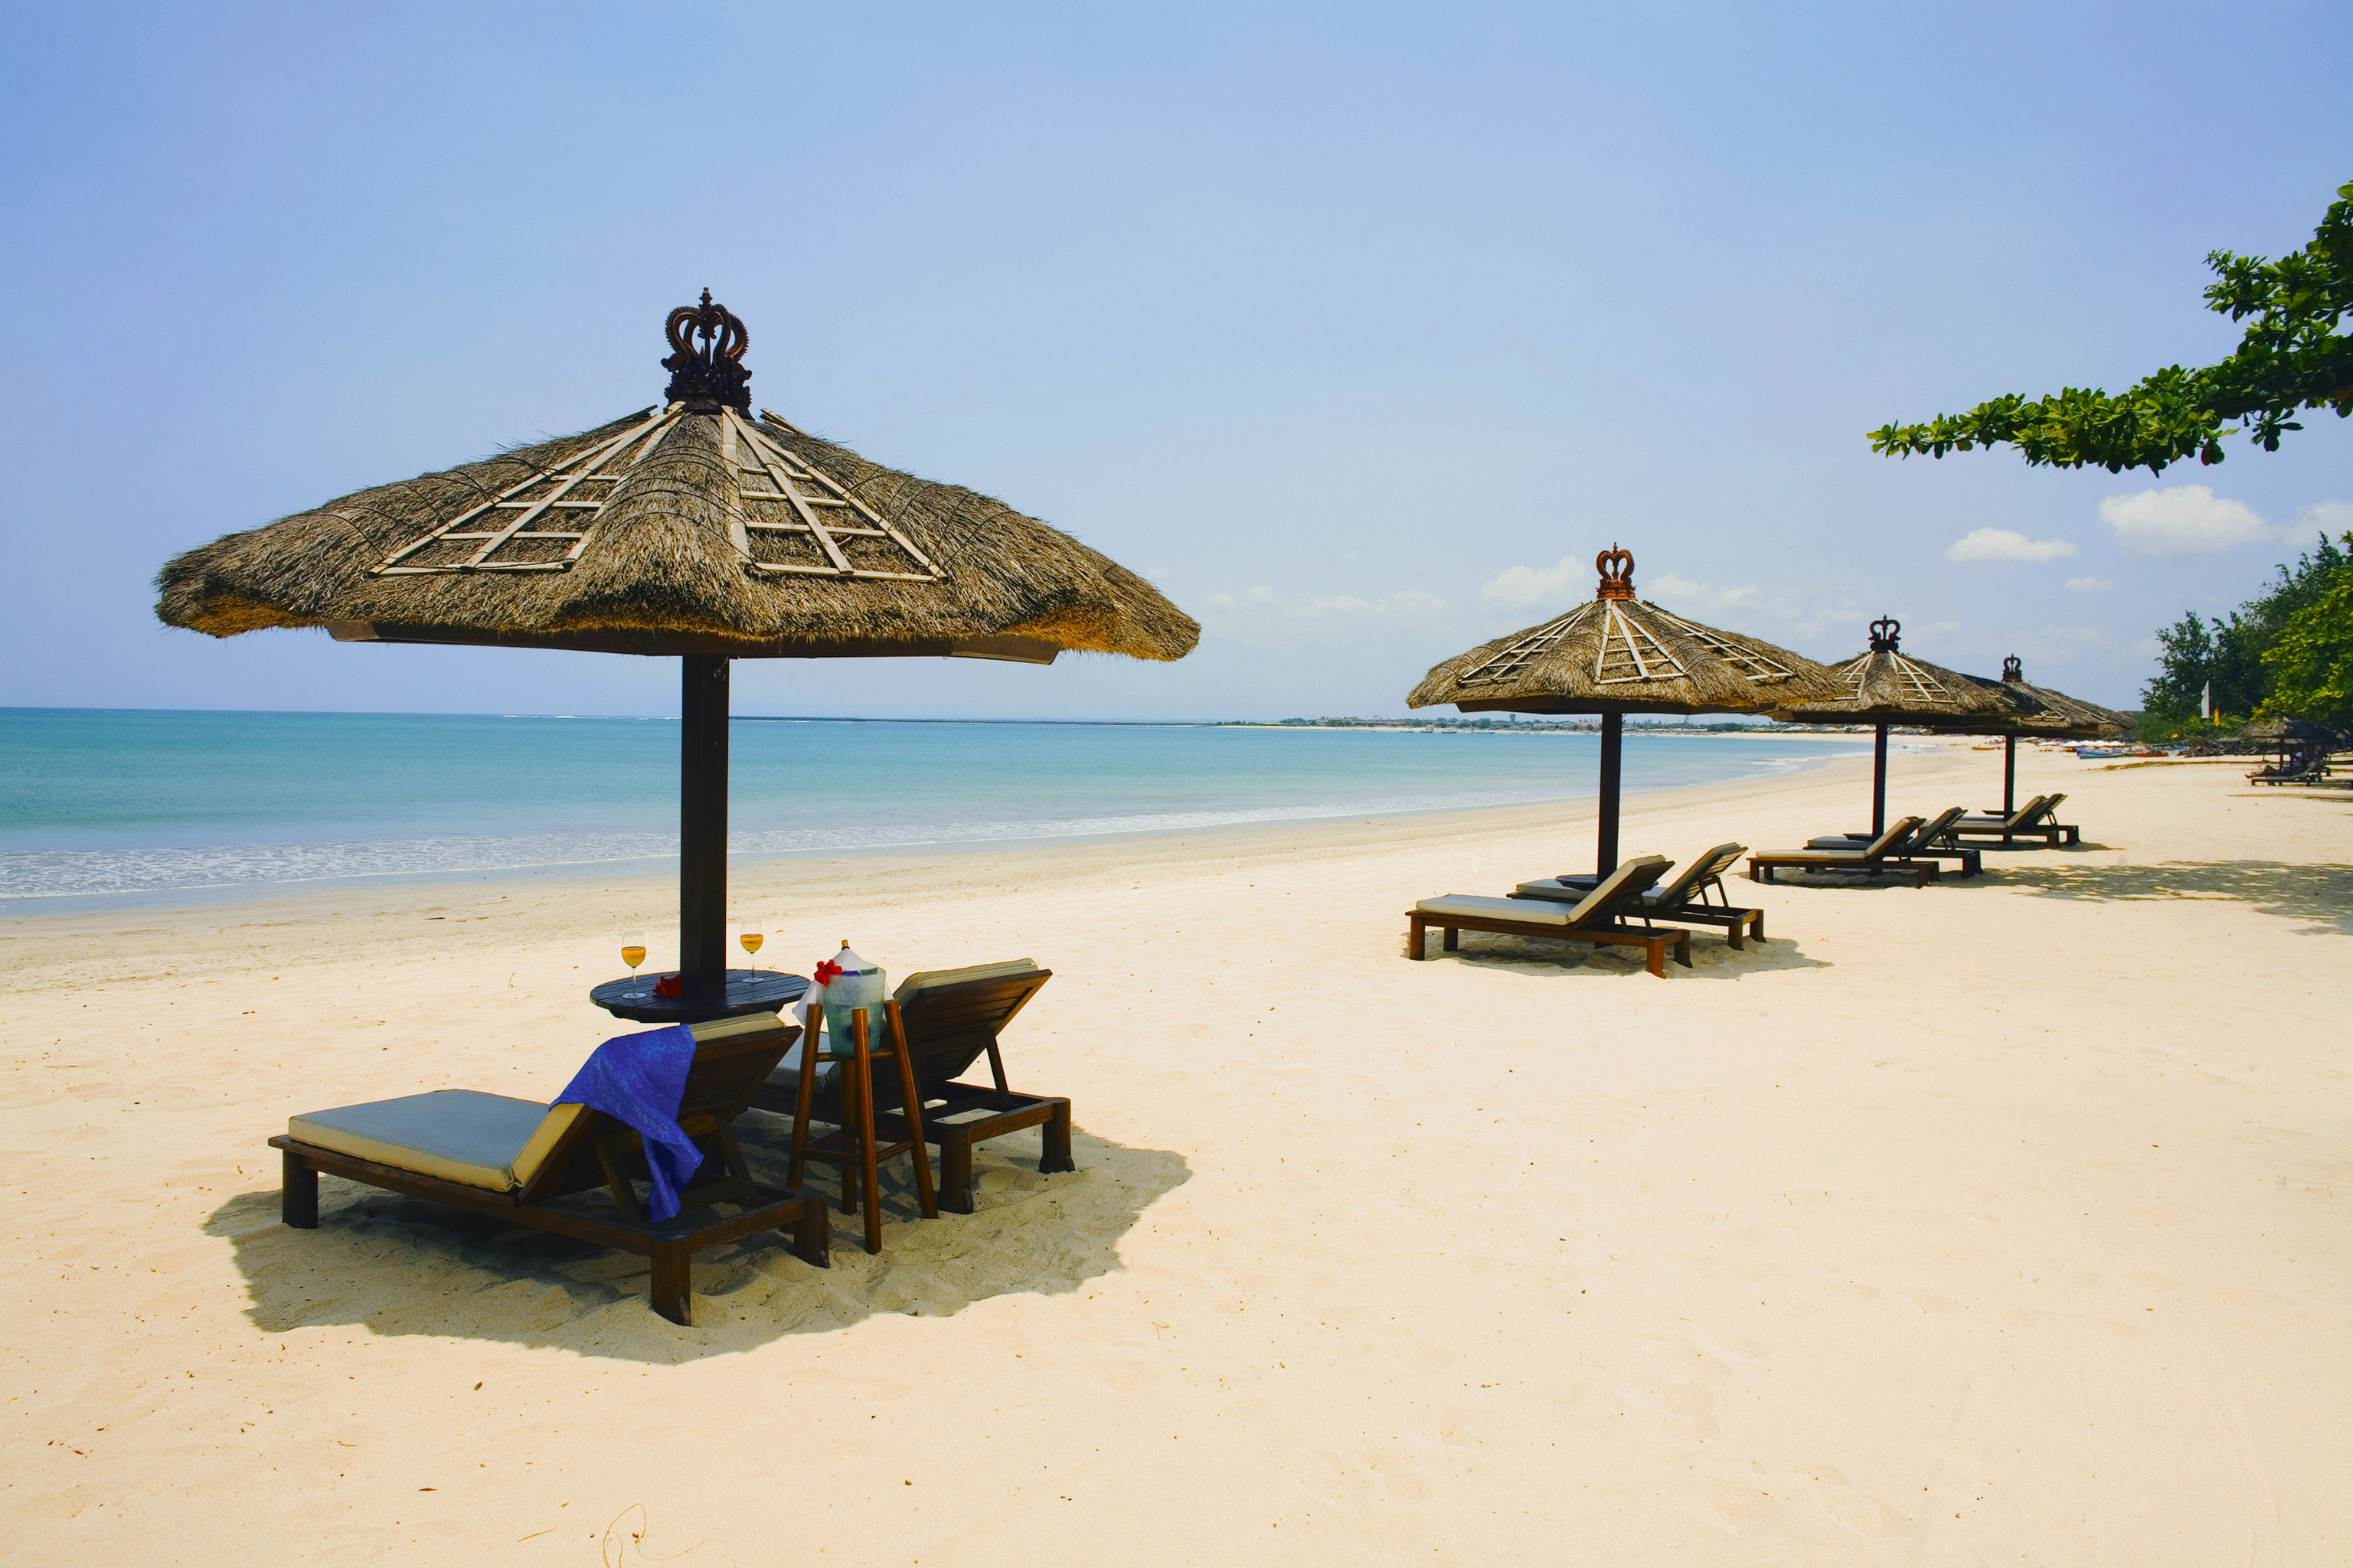 Beach Beachfront Luxury Romantic sky water umbrella chair Sea shore Ocean Coast sand Island cape travel caribbean shade sandy day